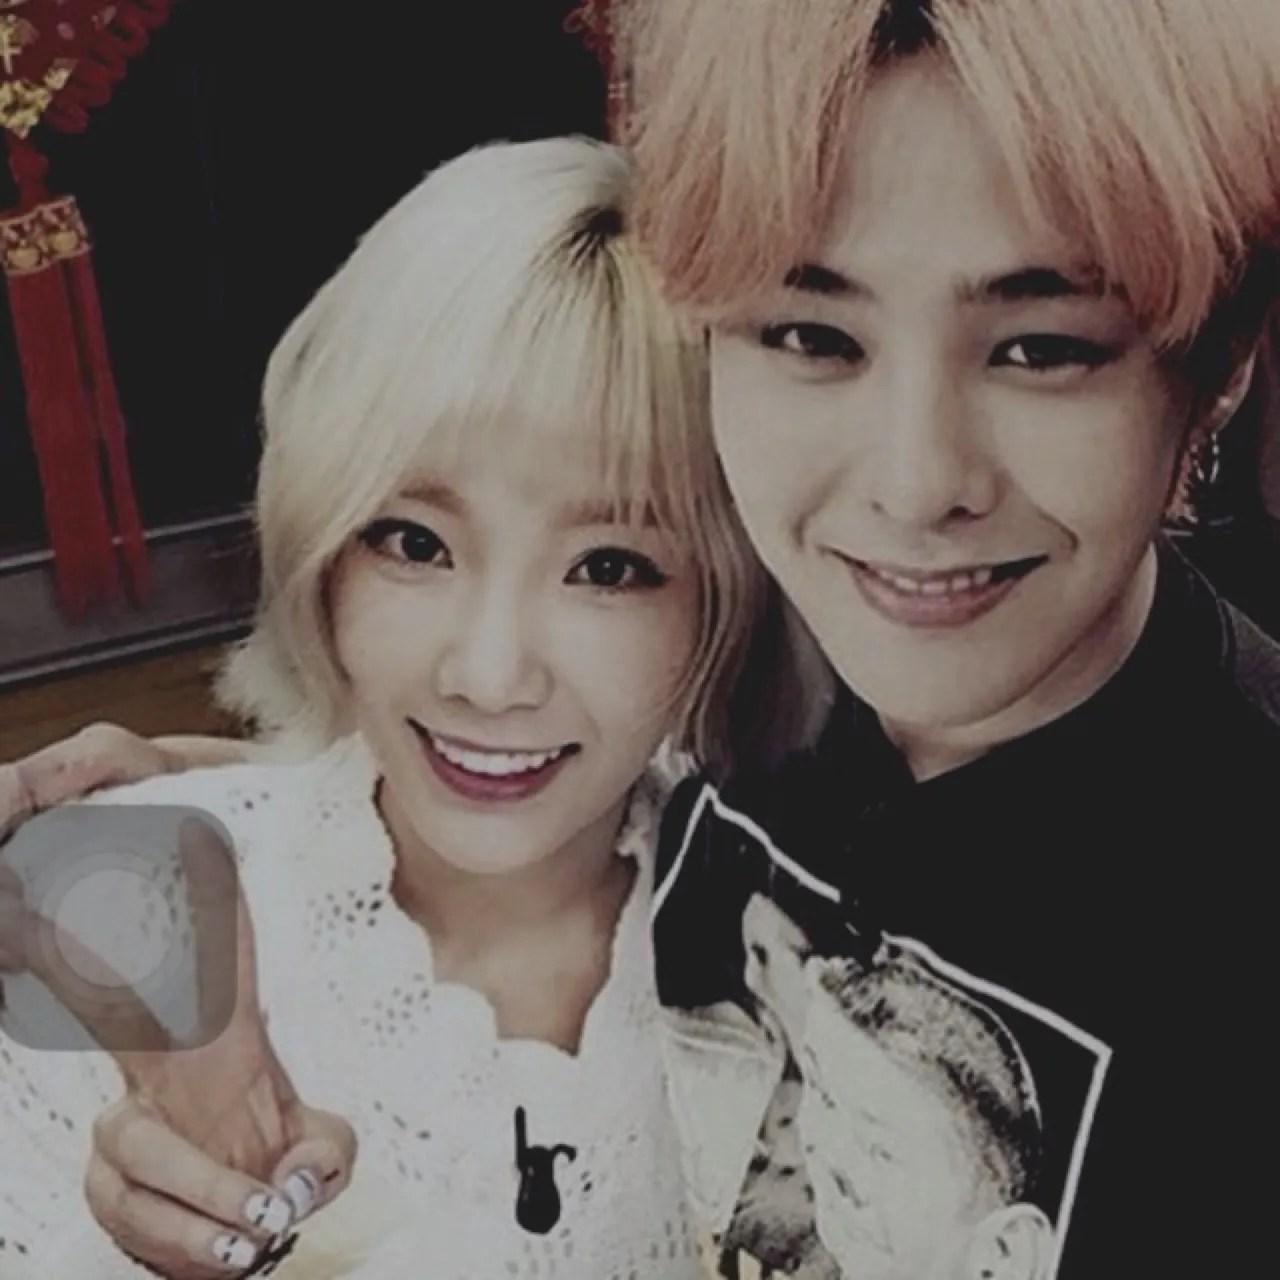 KPop: Fans Present Evidence That BIGBANG's G-Dragon & SNSD's Taeyeon